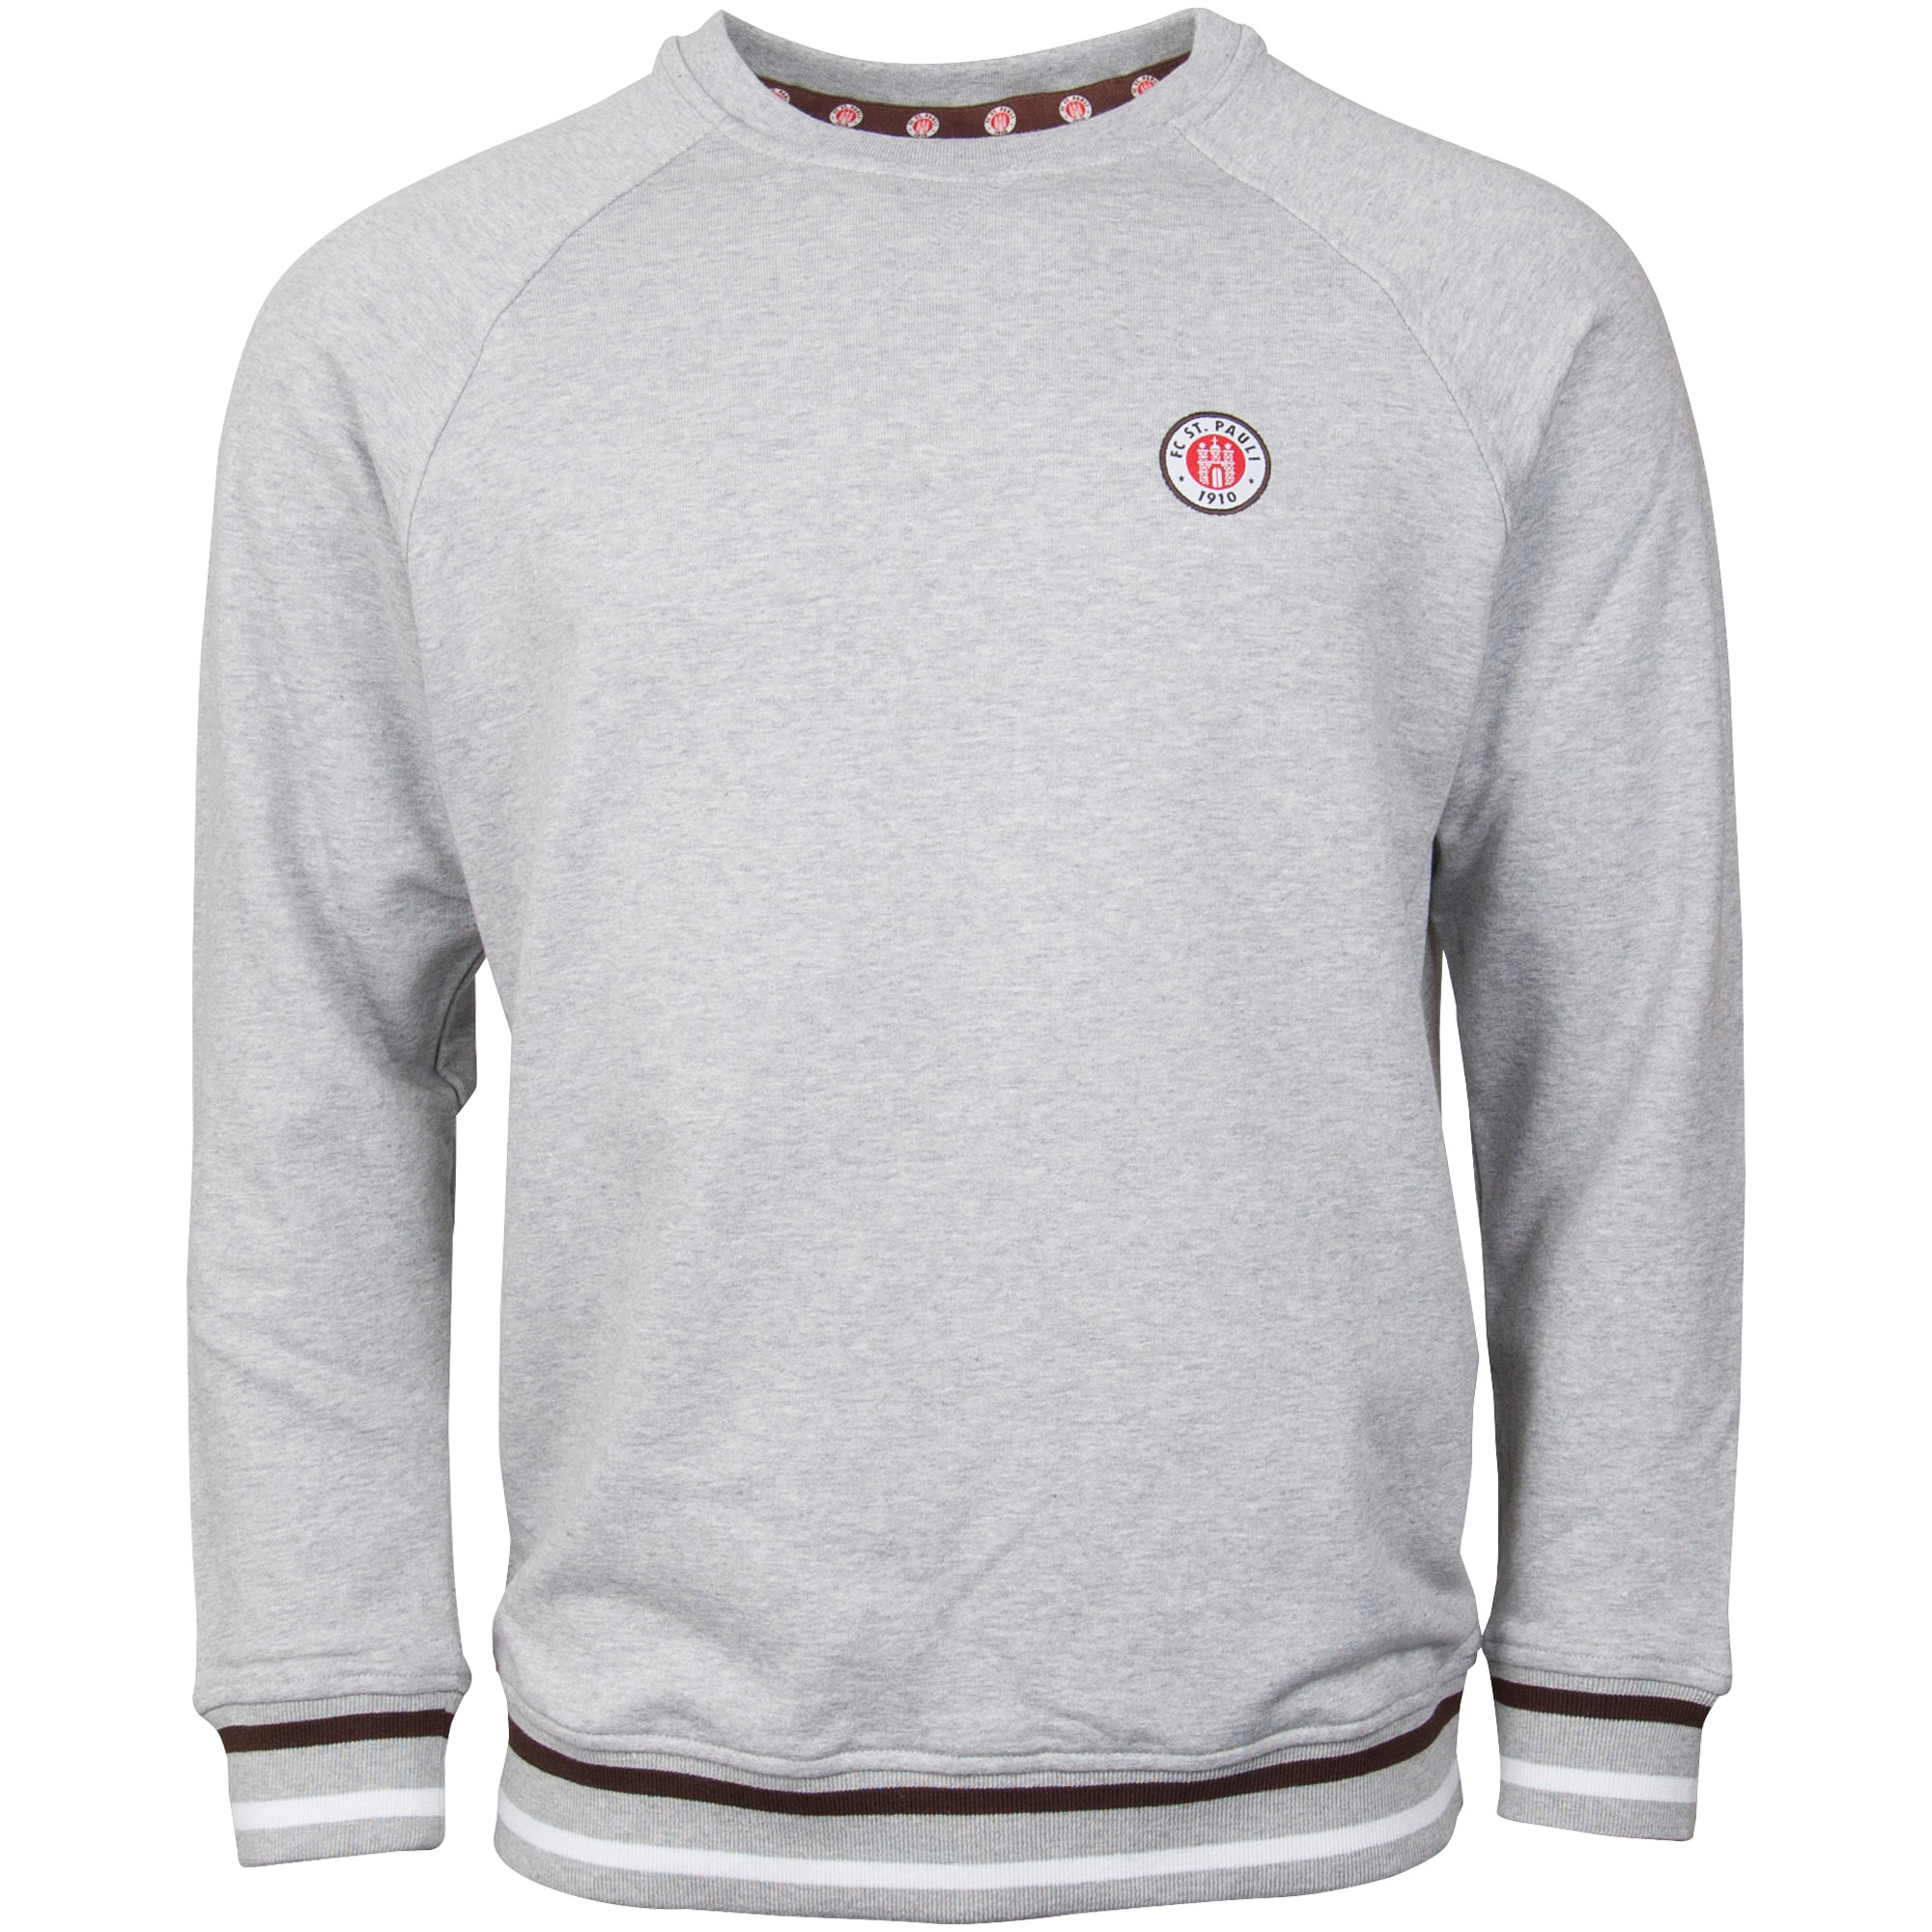 FC St. Pauli - Sweatshirt Club mit Logo - grau